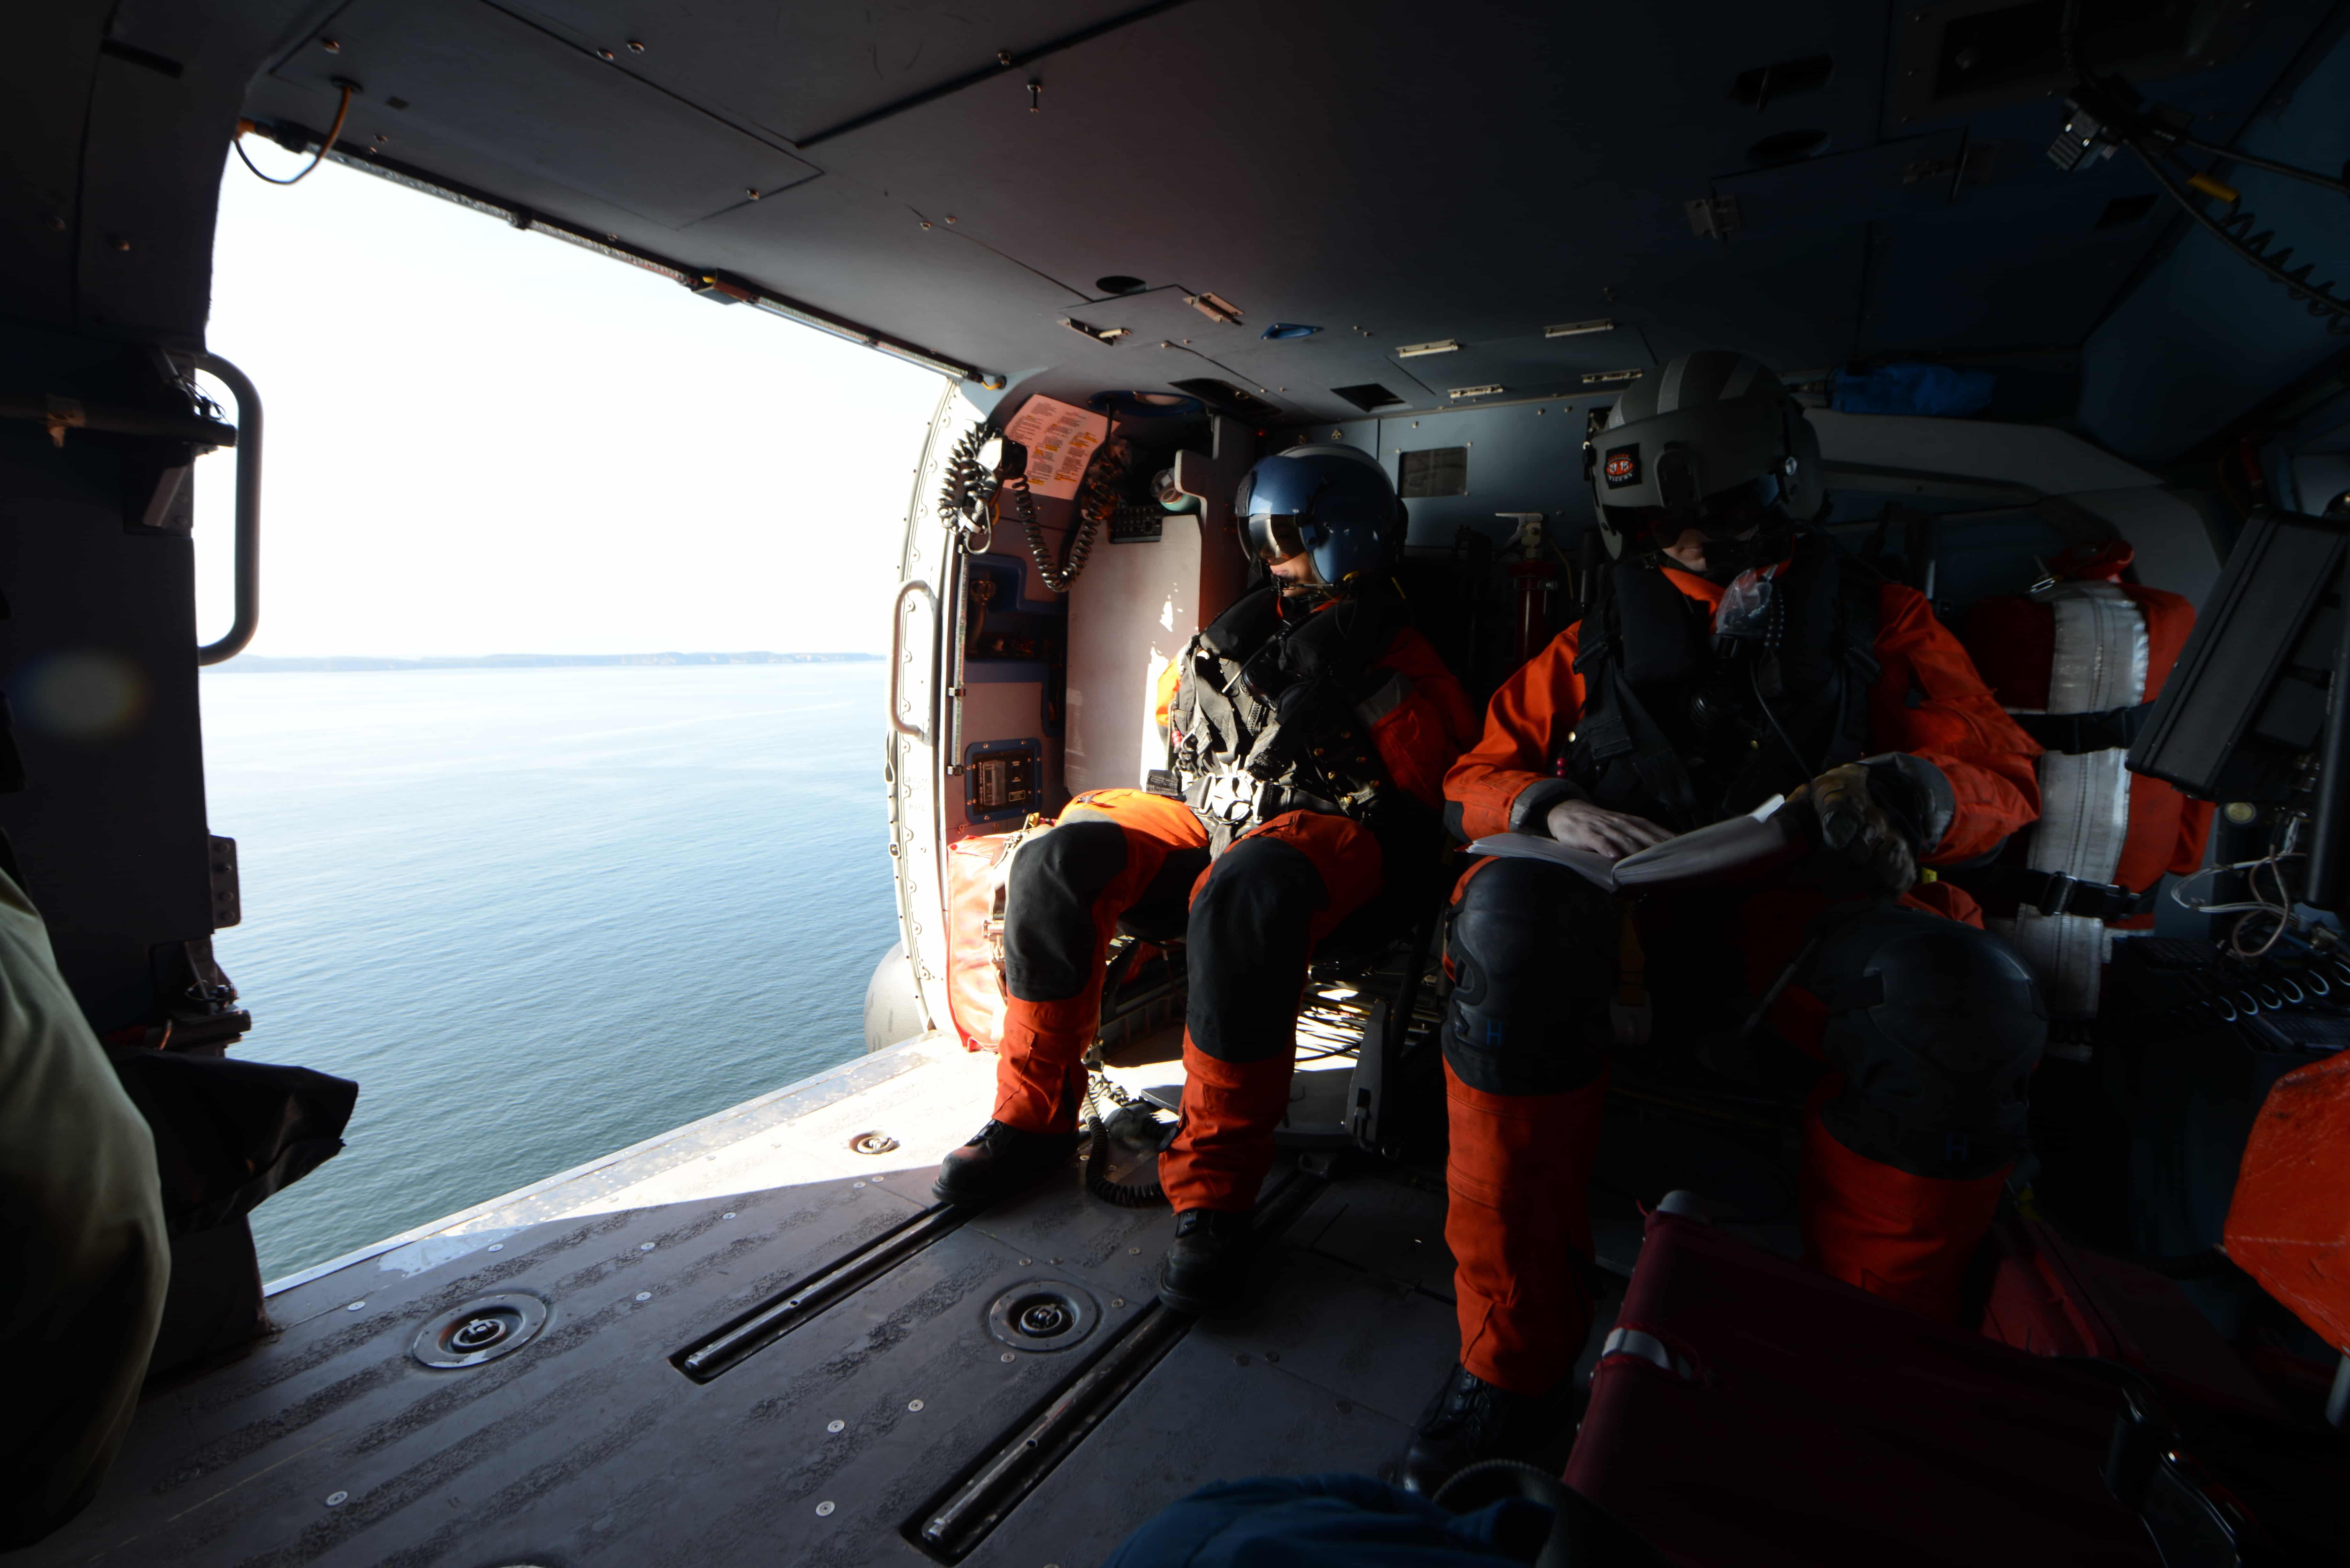 Two coast guard flight paramedics